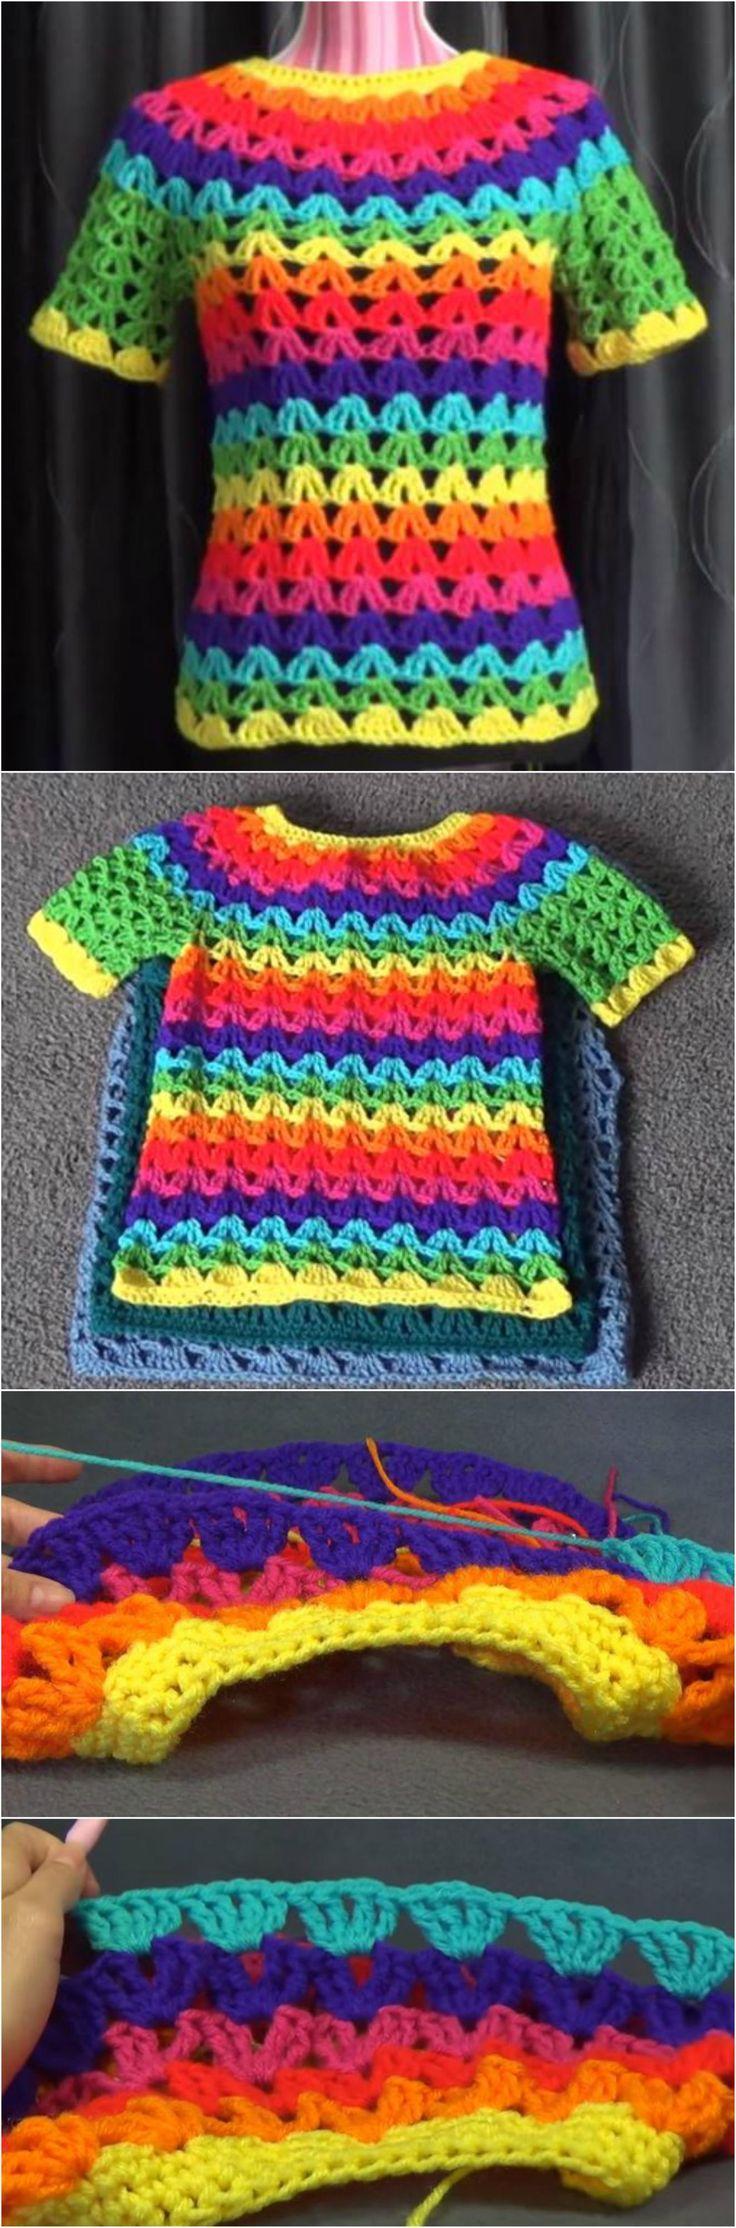 Crochet Rainbow Tunic